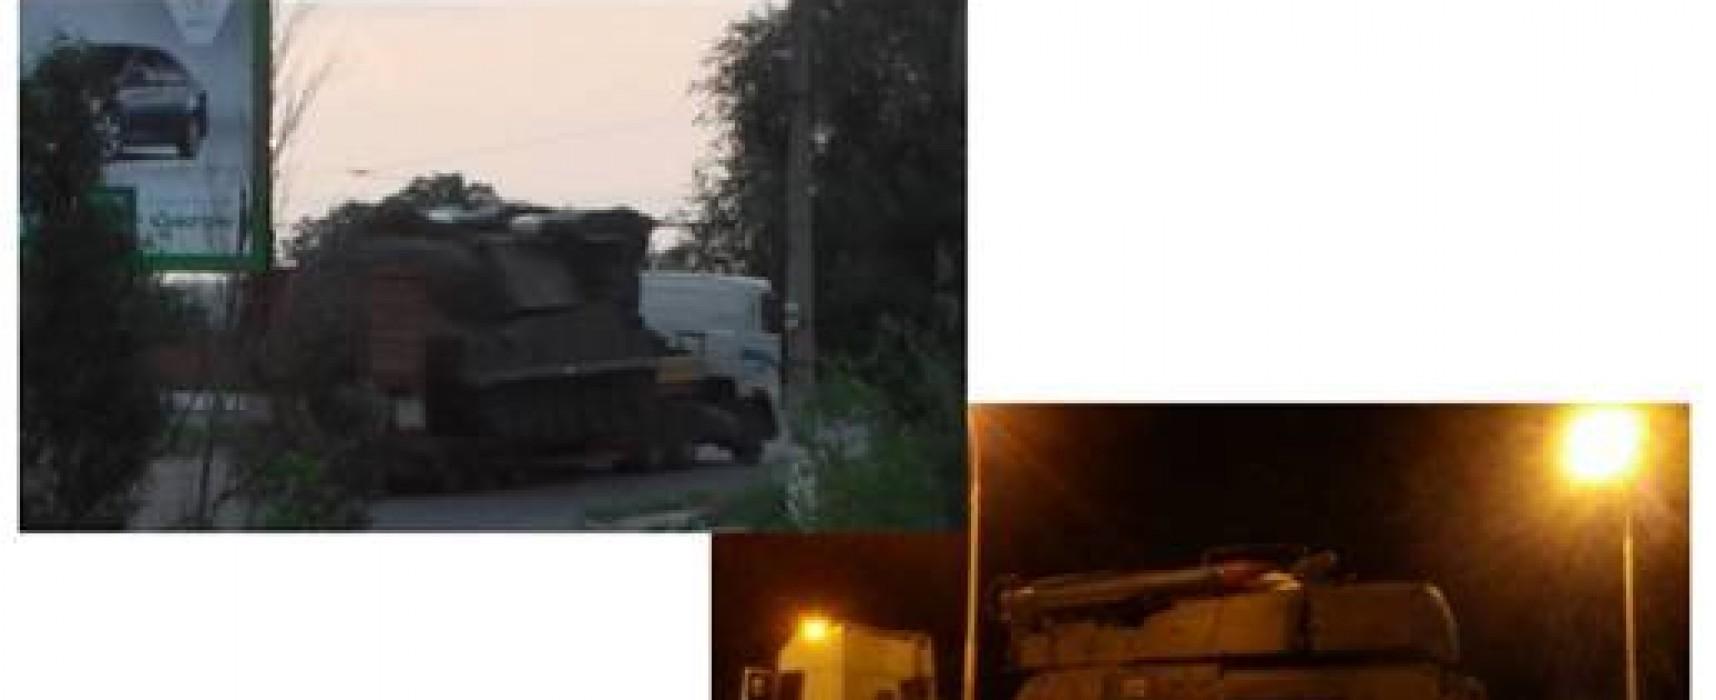 Did This Ukrainian Soldier Prove Ukraine Shot Down MH17?